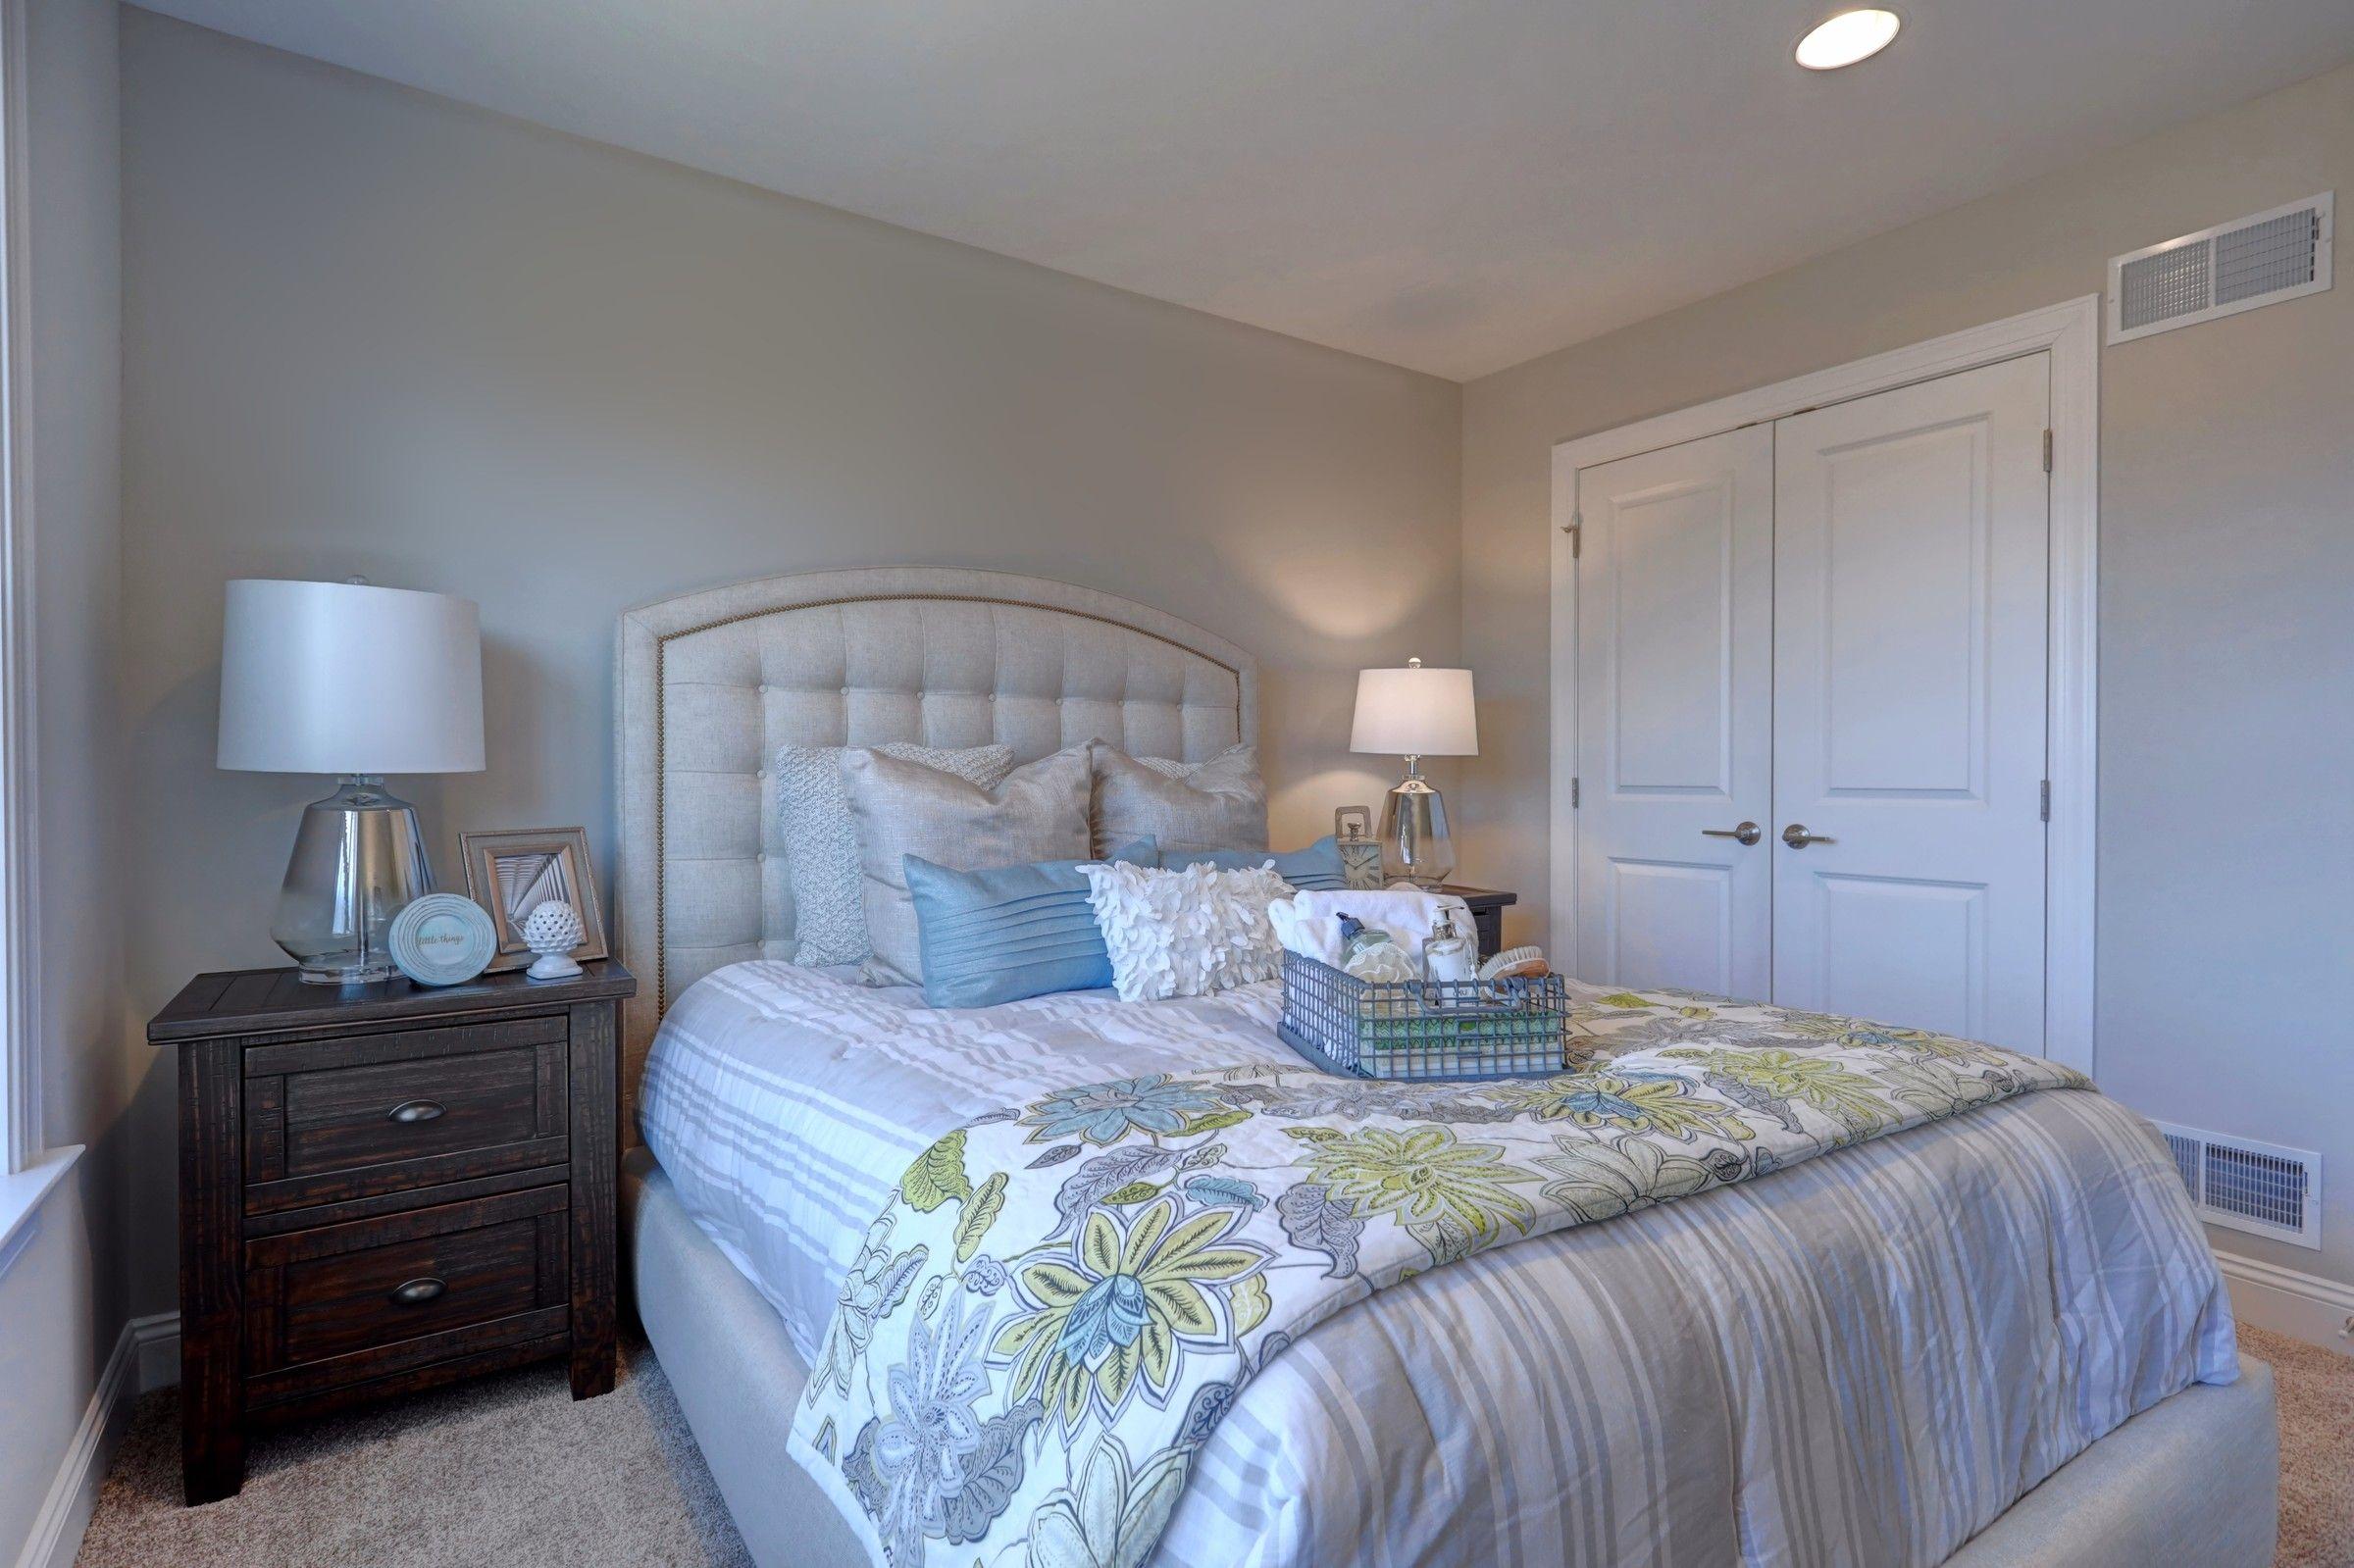 Bedroom featured in the Windsor Heritage By Keystone Custom Homes in Philadelphia, PA